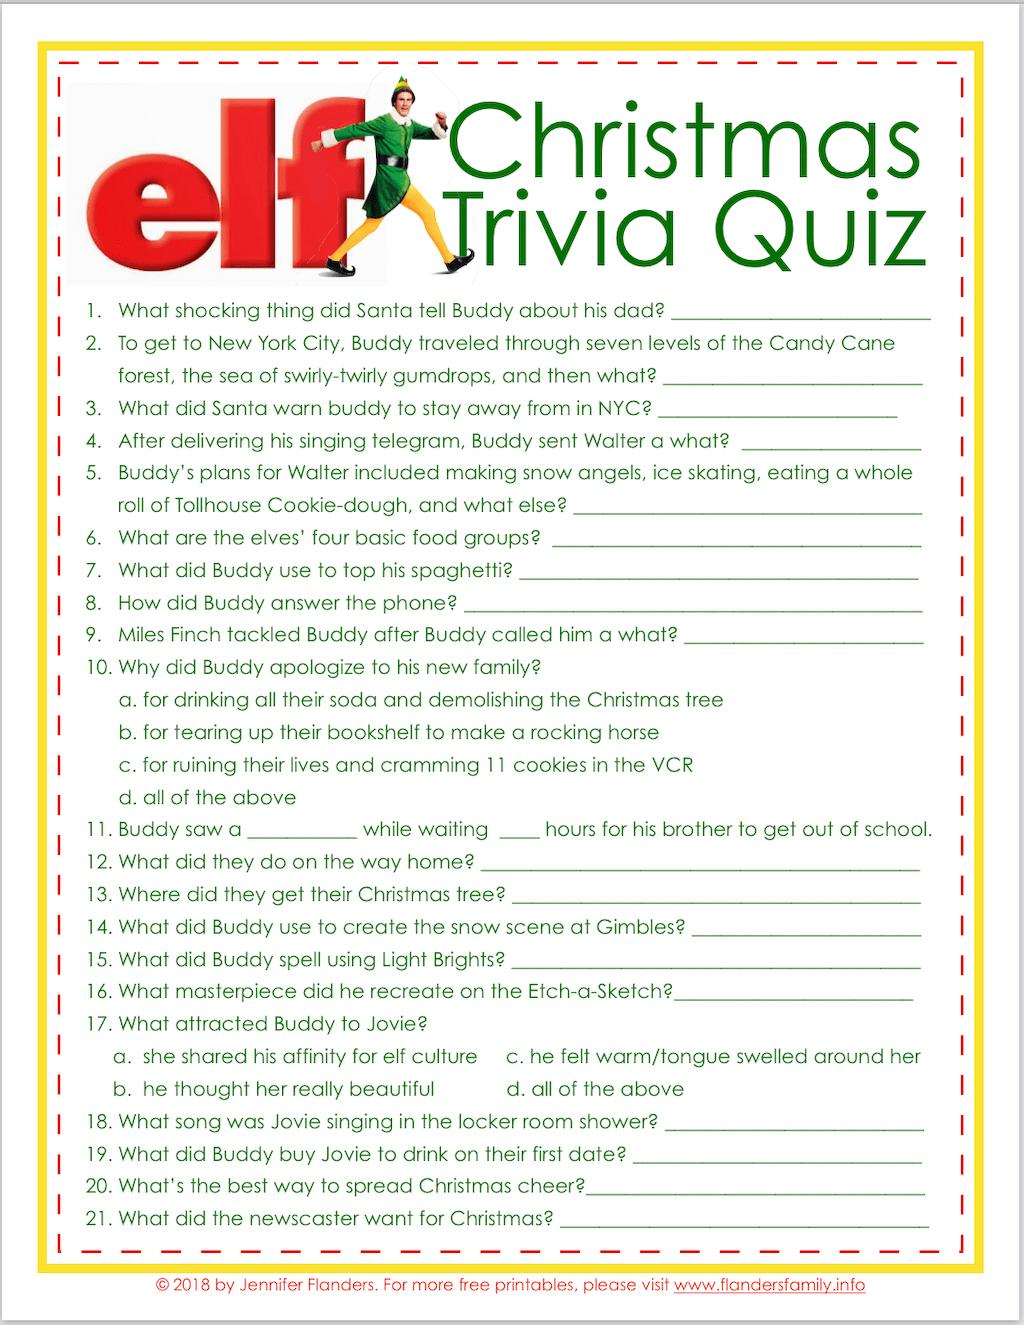 Elf Trivia Christmas Quiz Free Printable